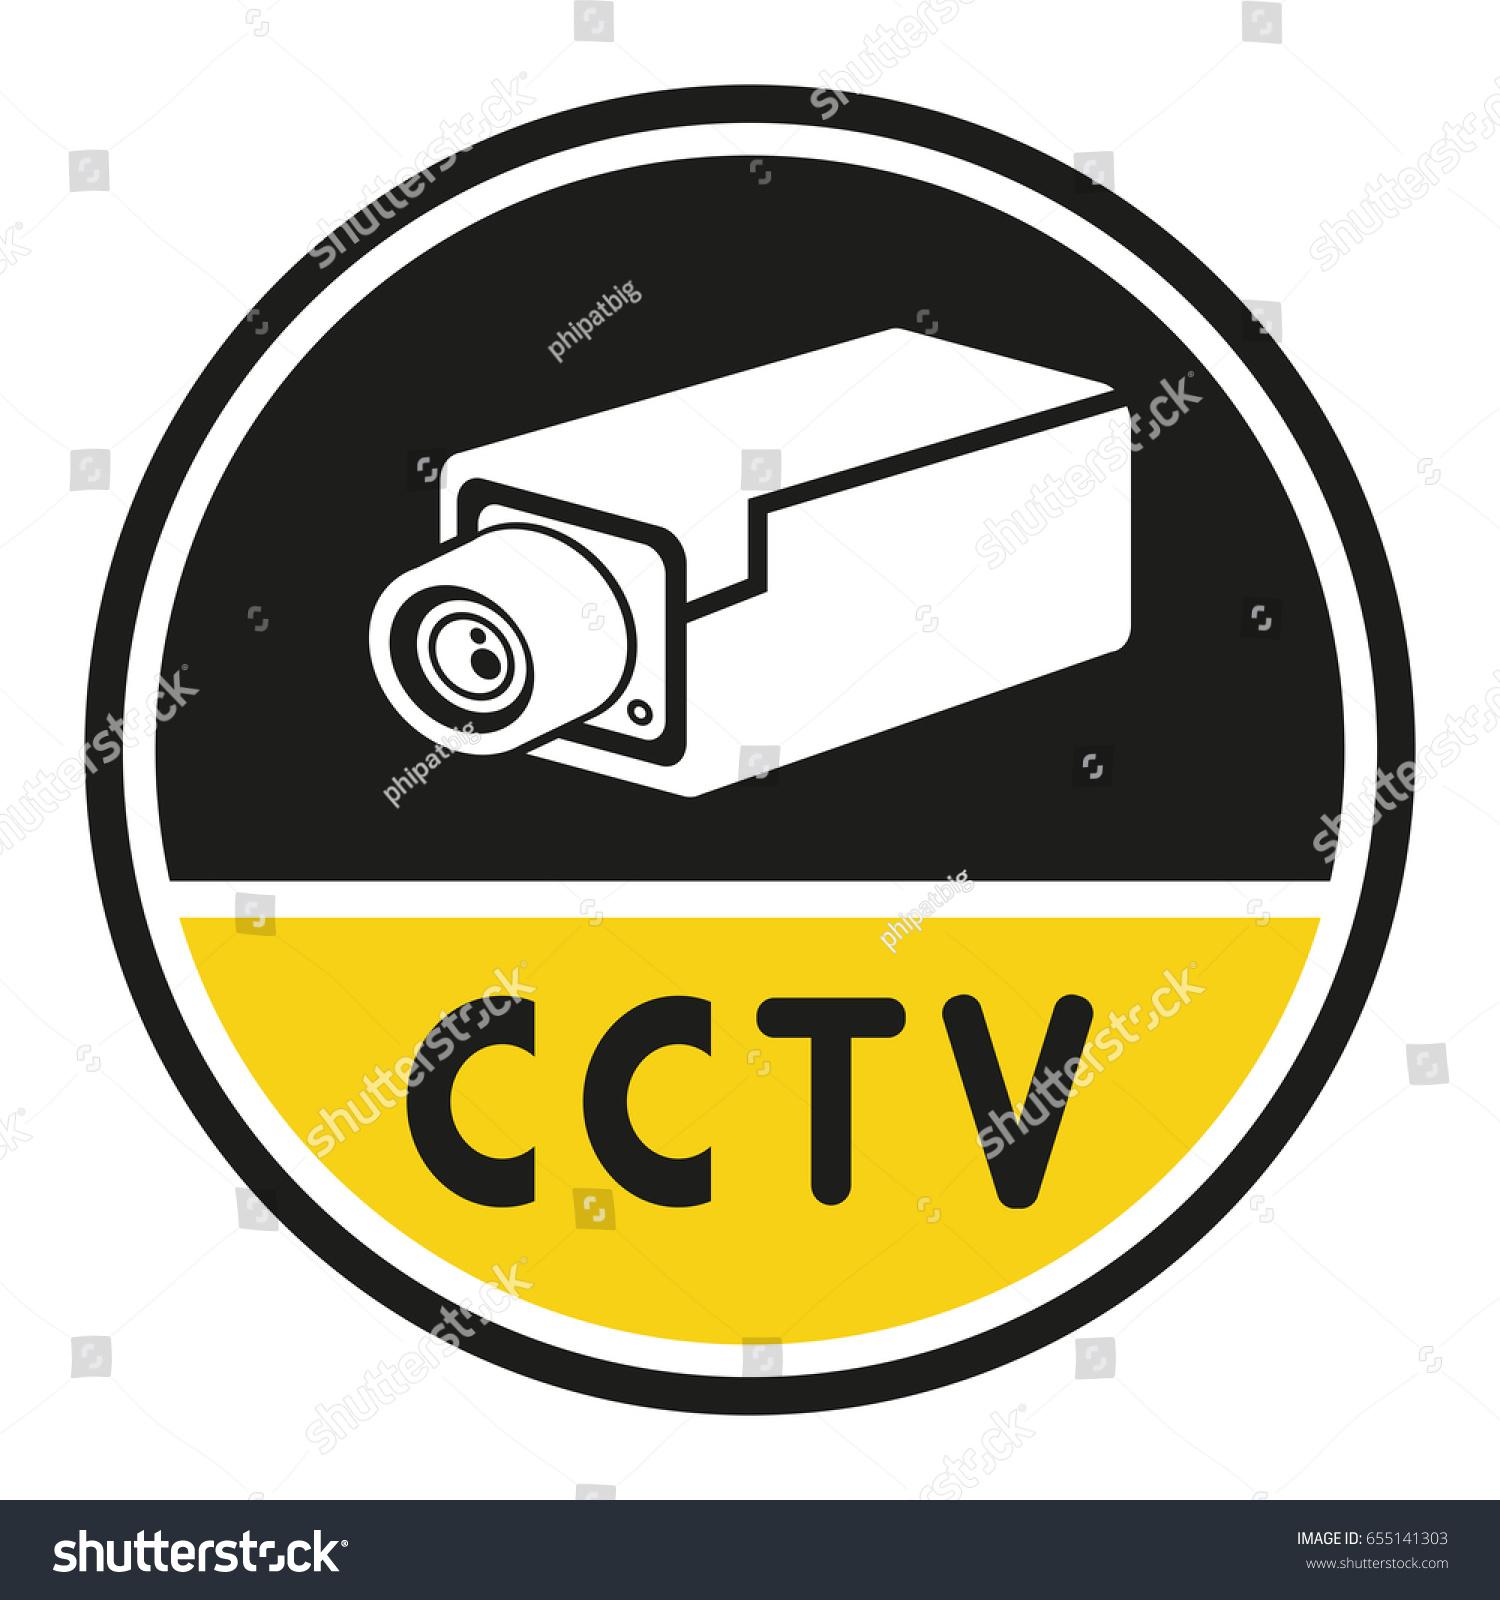 Cctv Security Camera Symbol Stock Vector 655141303 Shutterstock